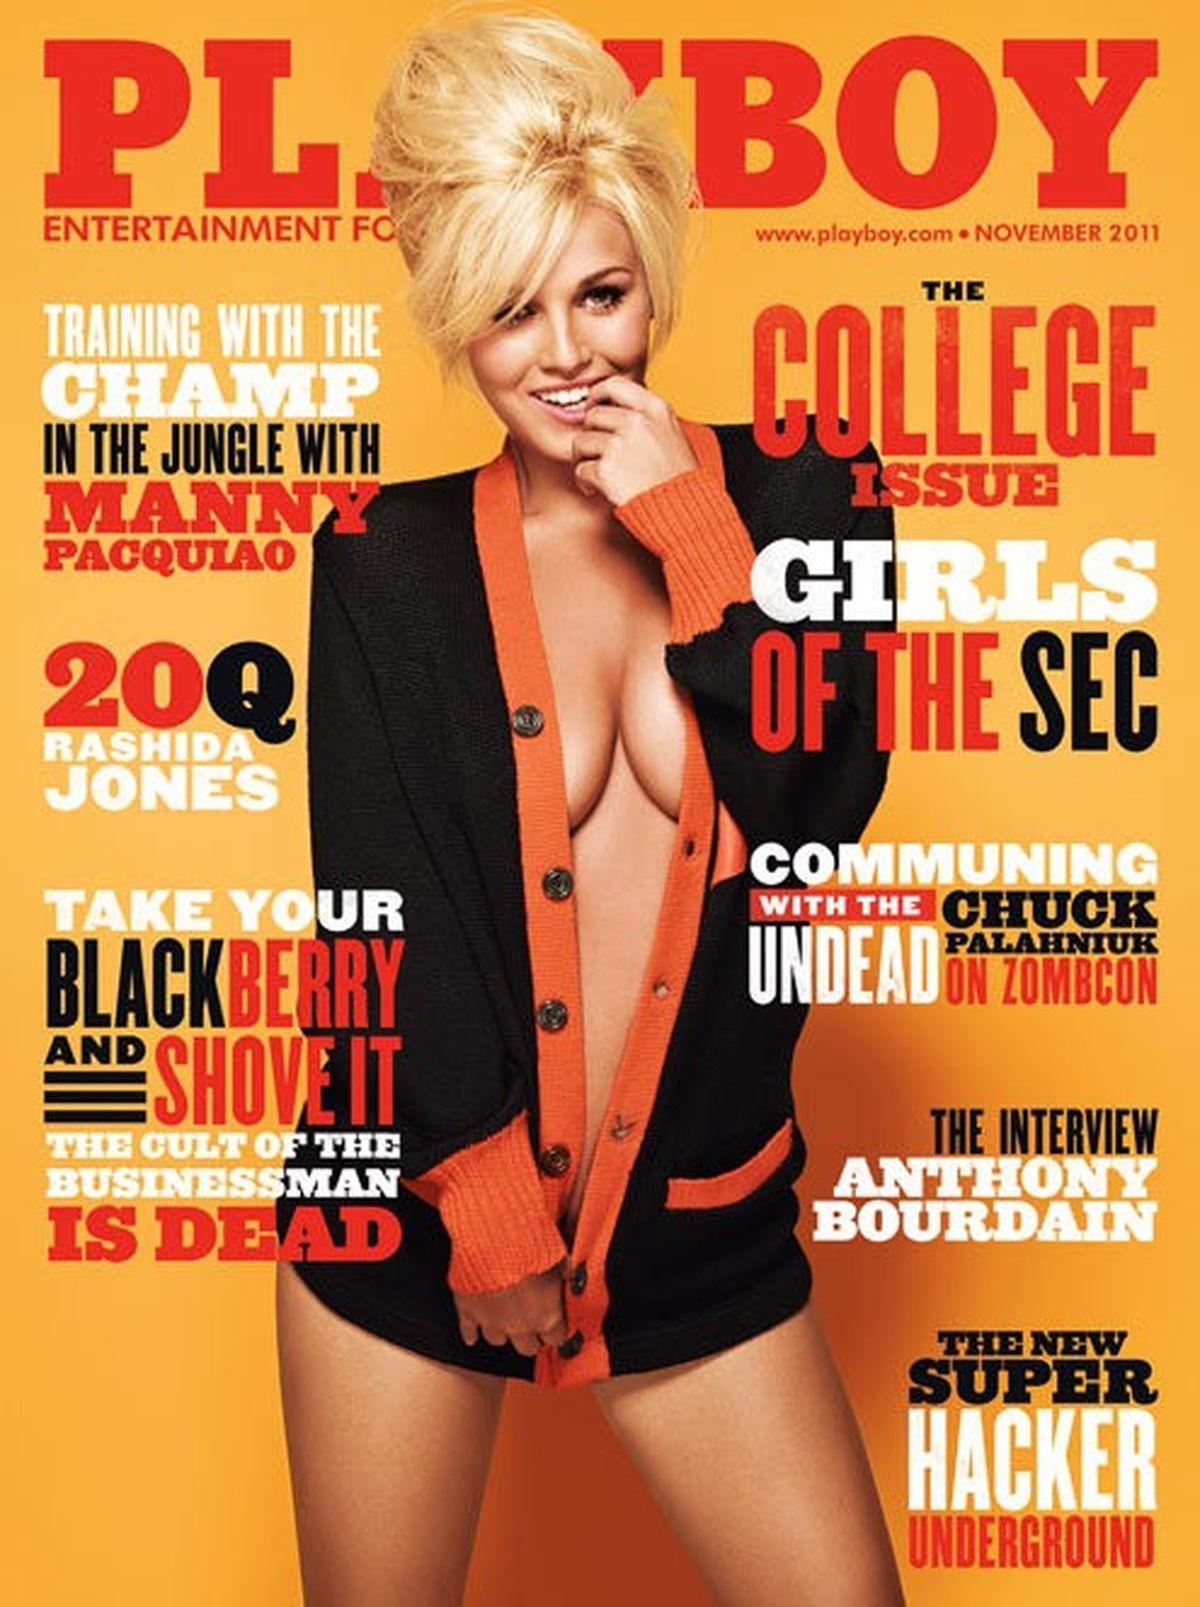 Playboy November 2011 - Girls Of The SEC